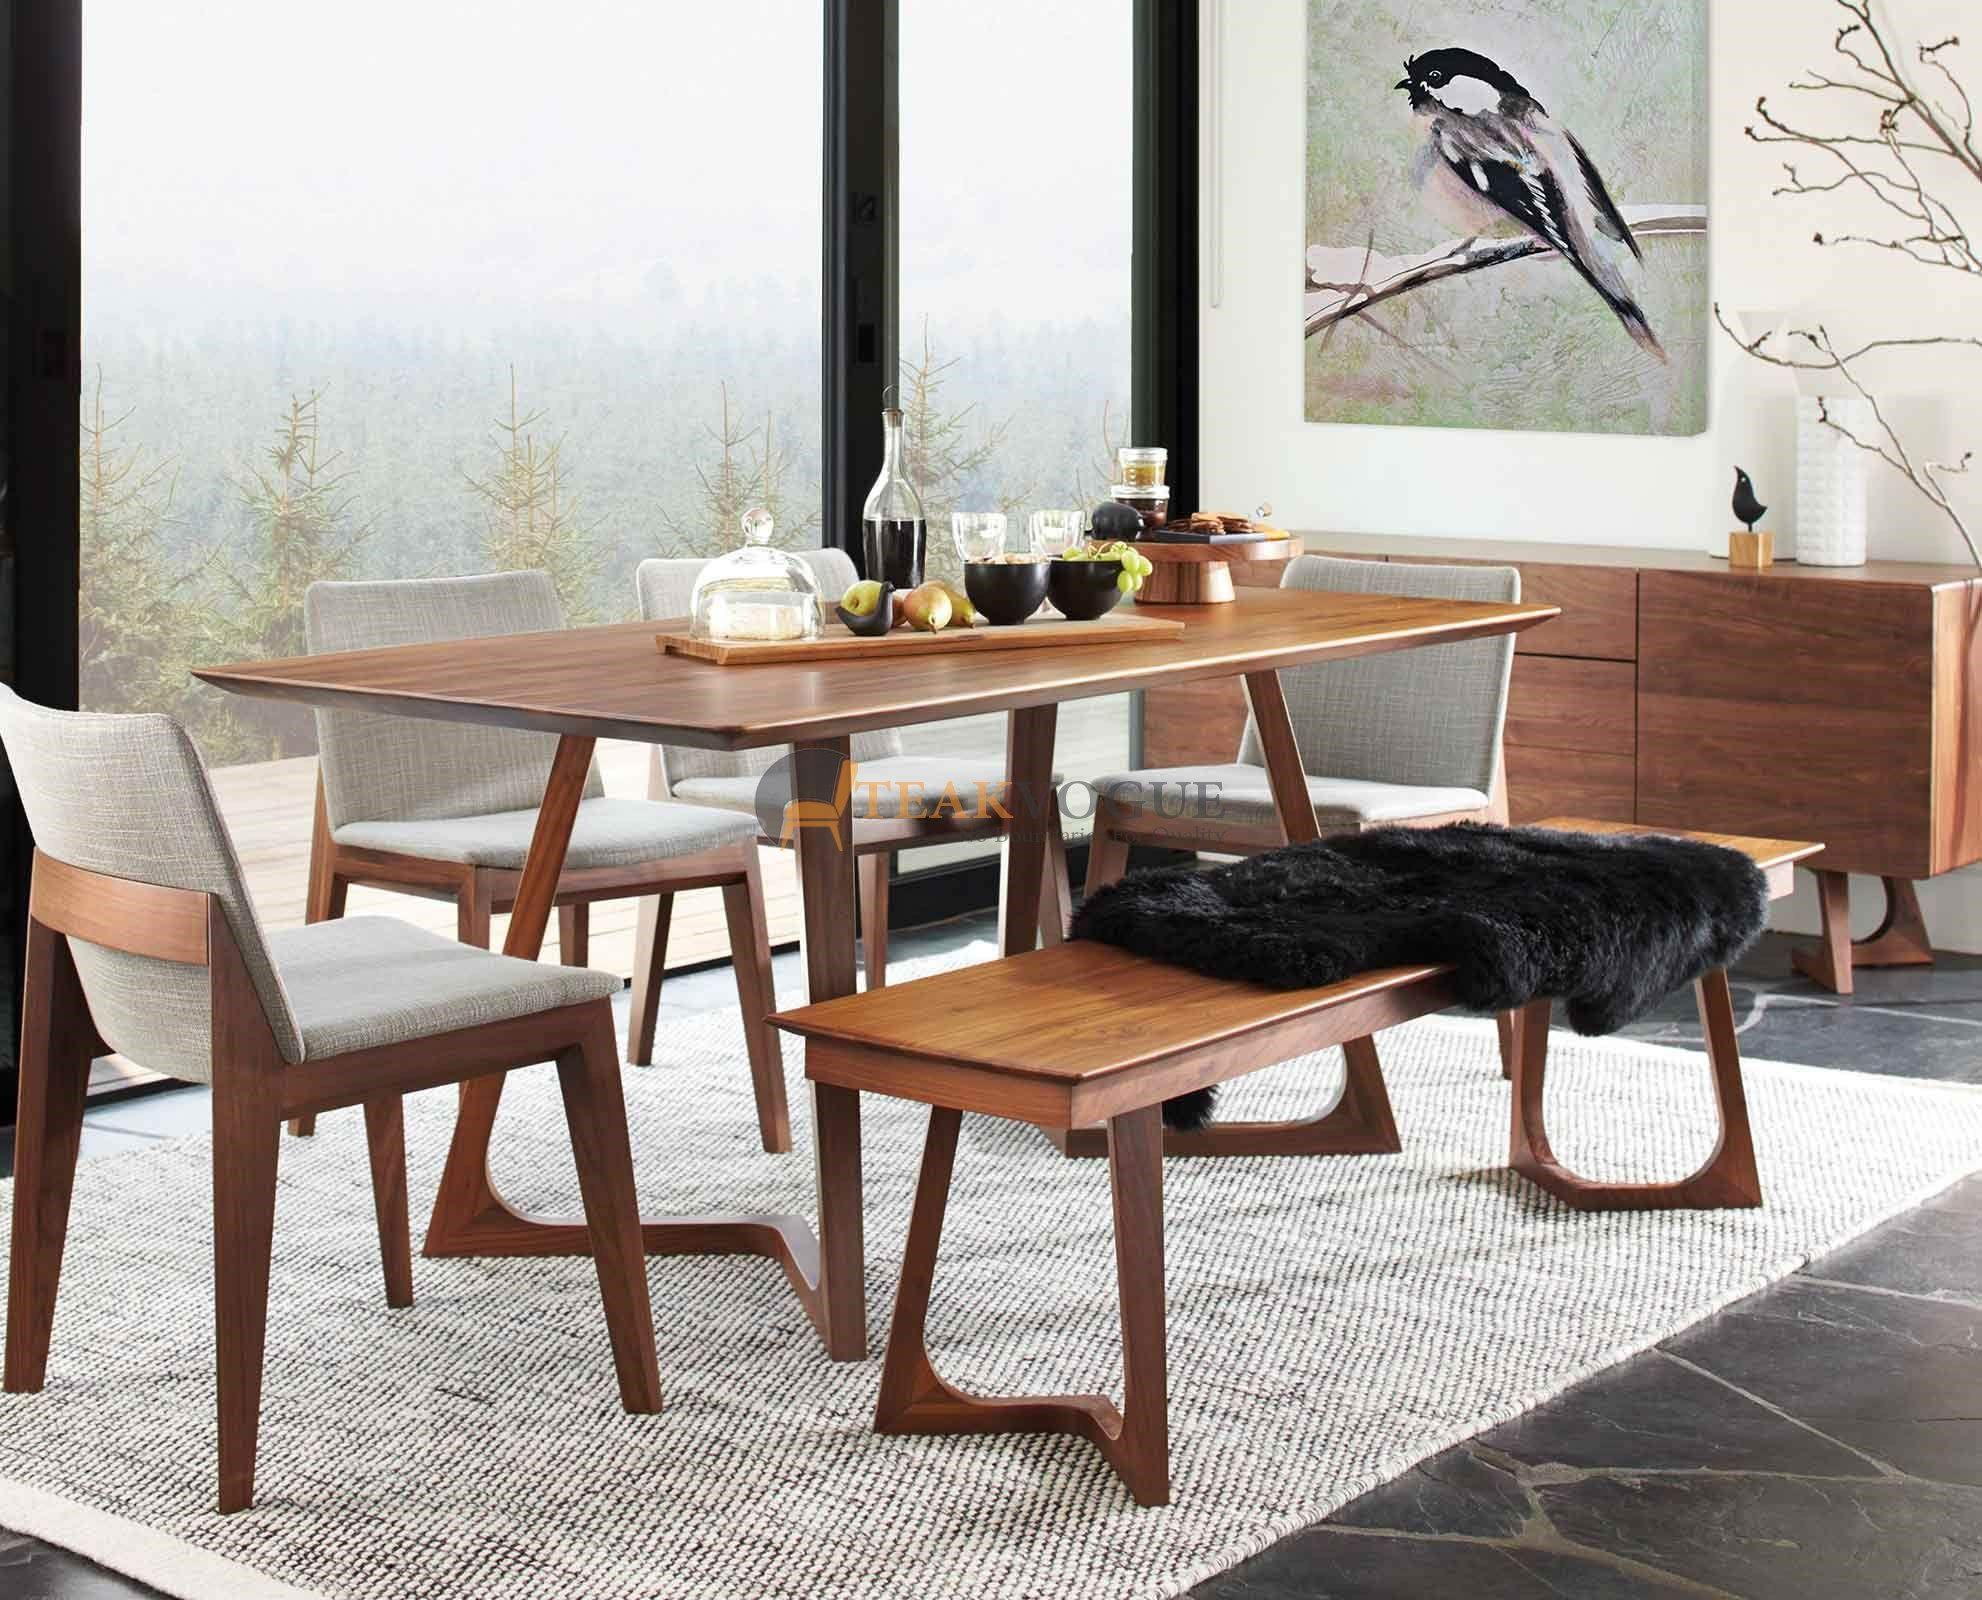 Positano Dining Table 160 Solid Teak Wood Dining Tables Pj